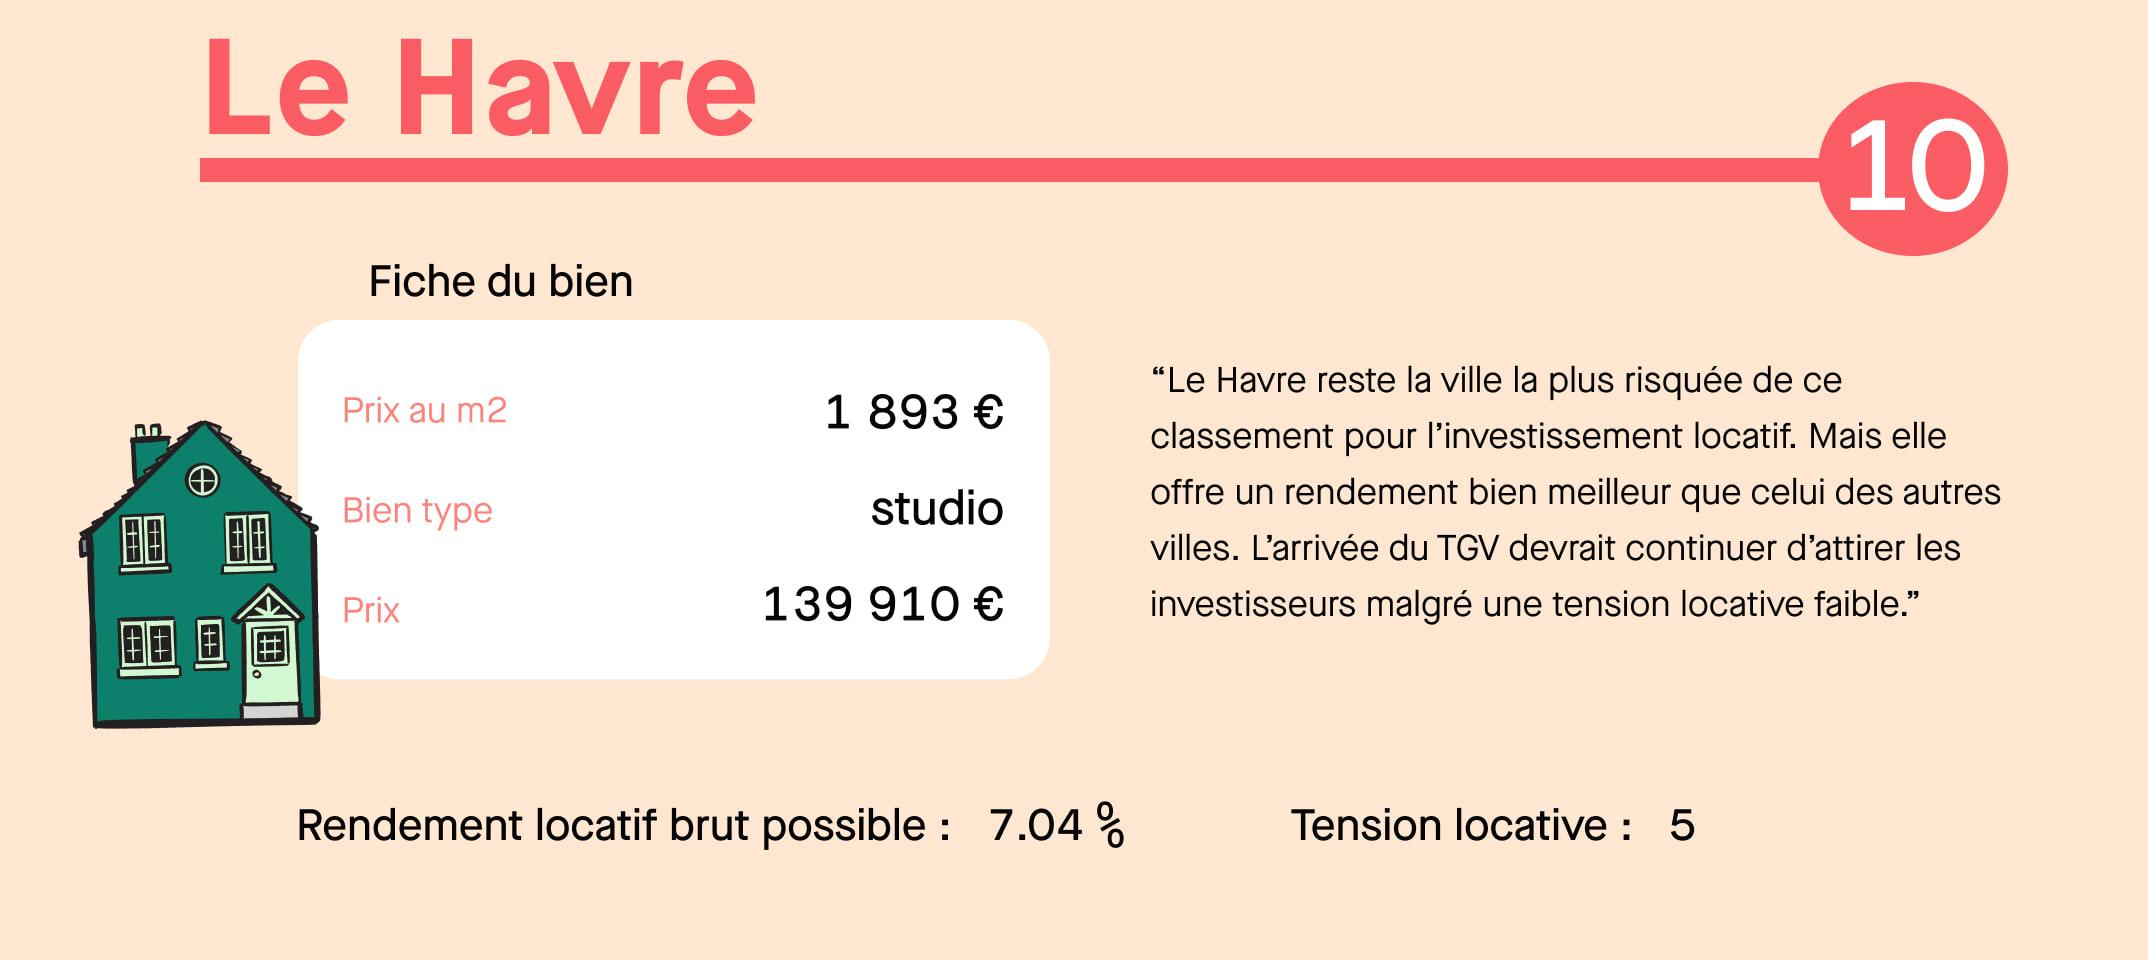 Infographie investissement locatif Le Havre